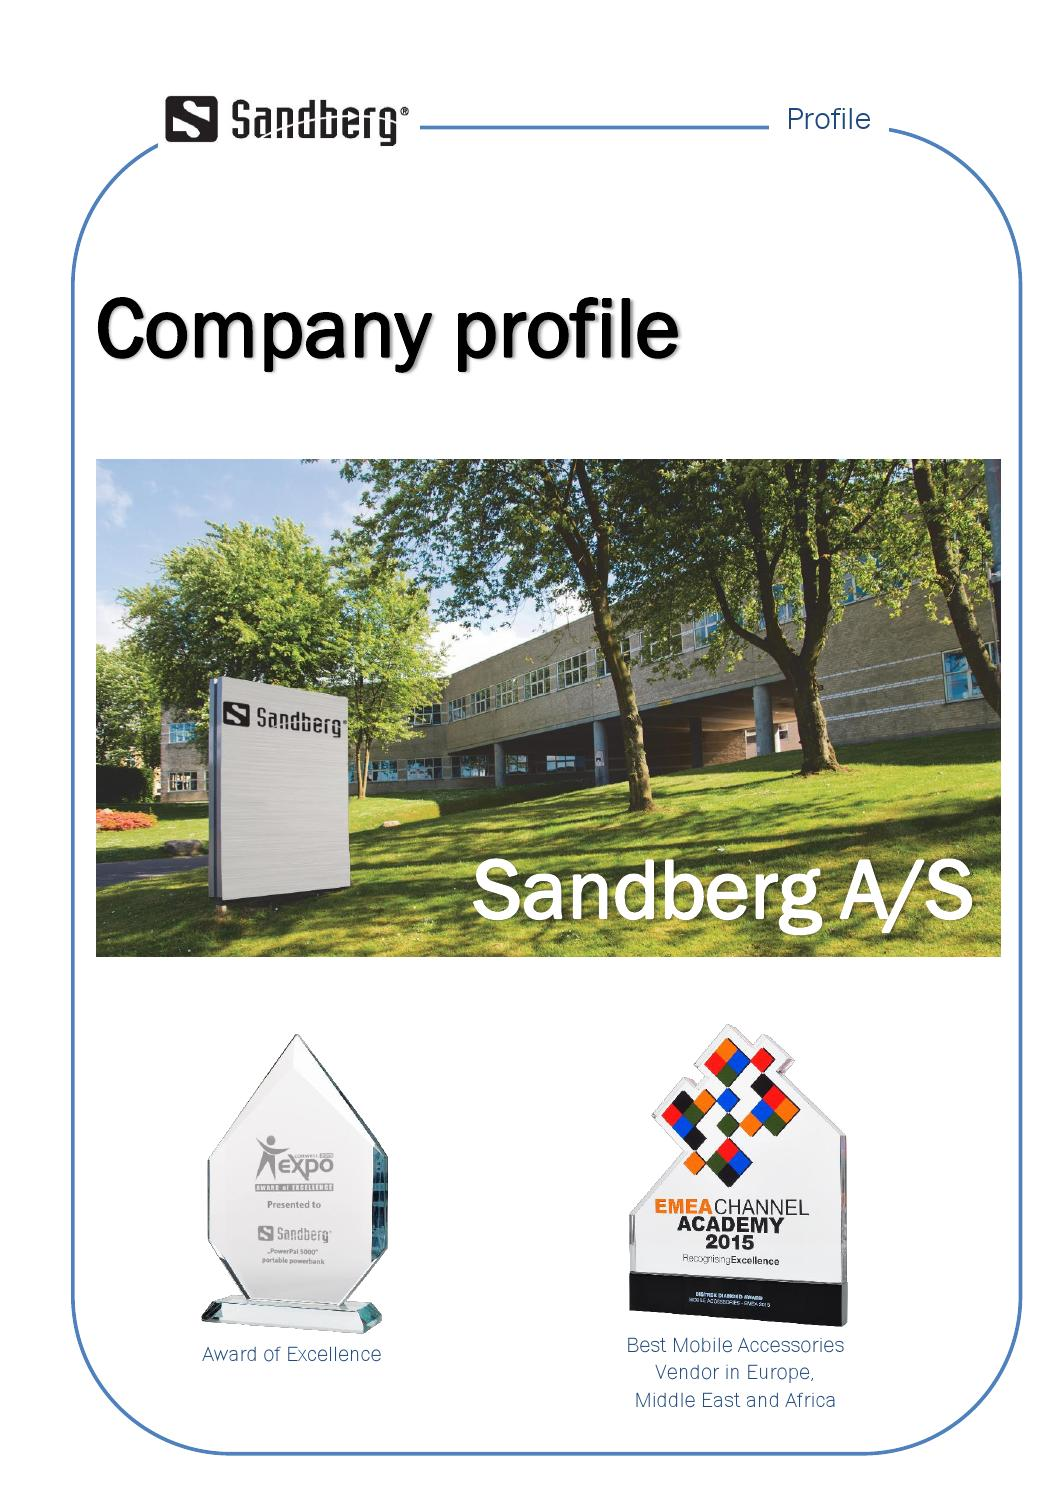 Sandberg Company Profile 2015 by Sandberg A/S